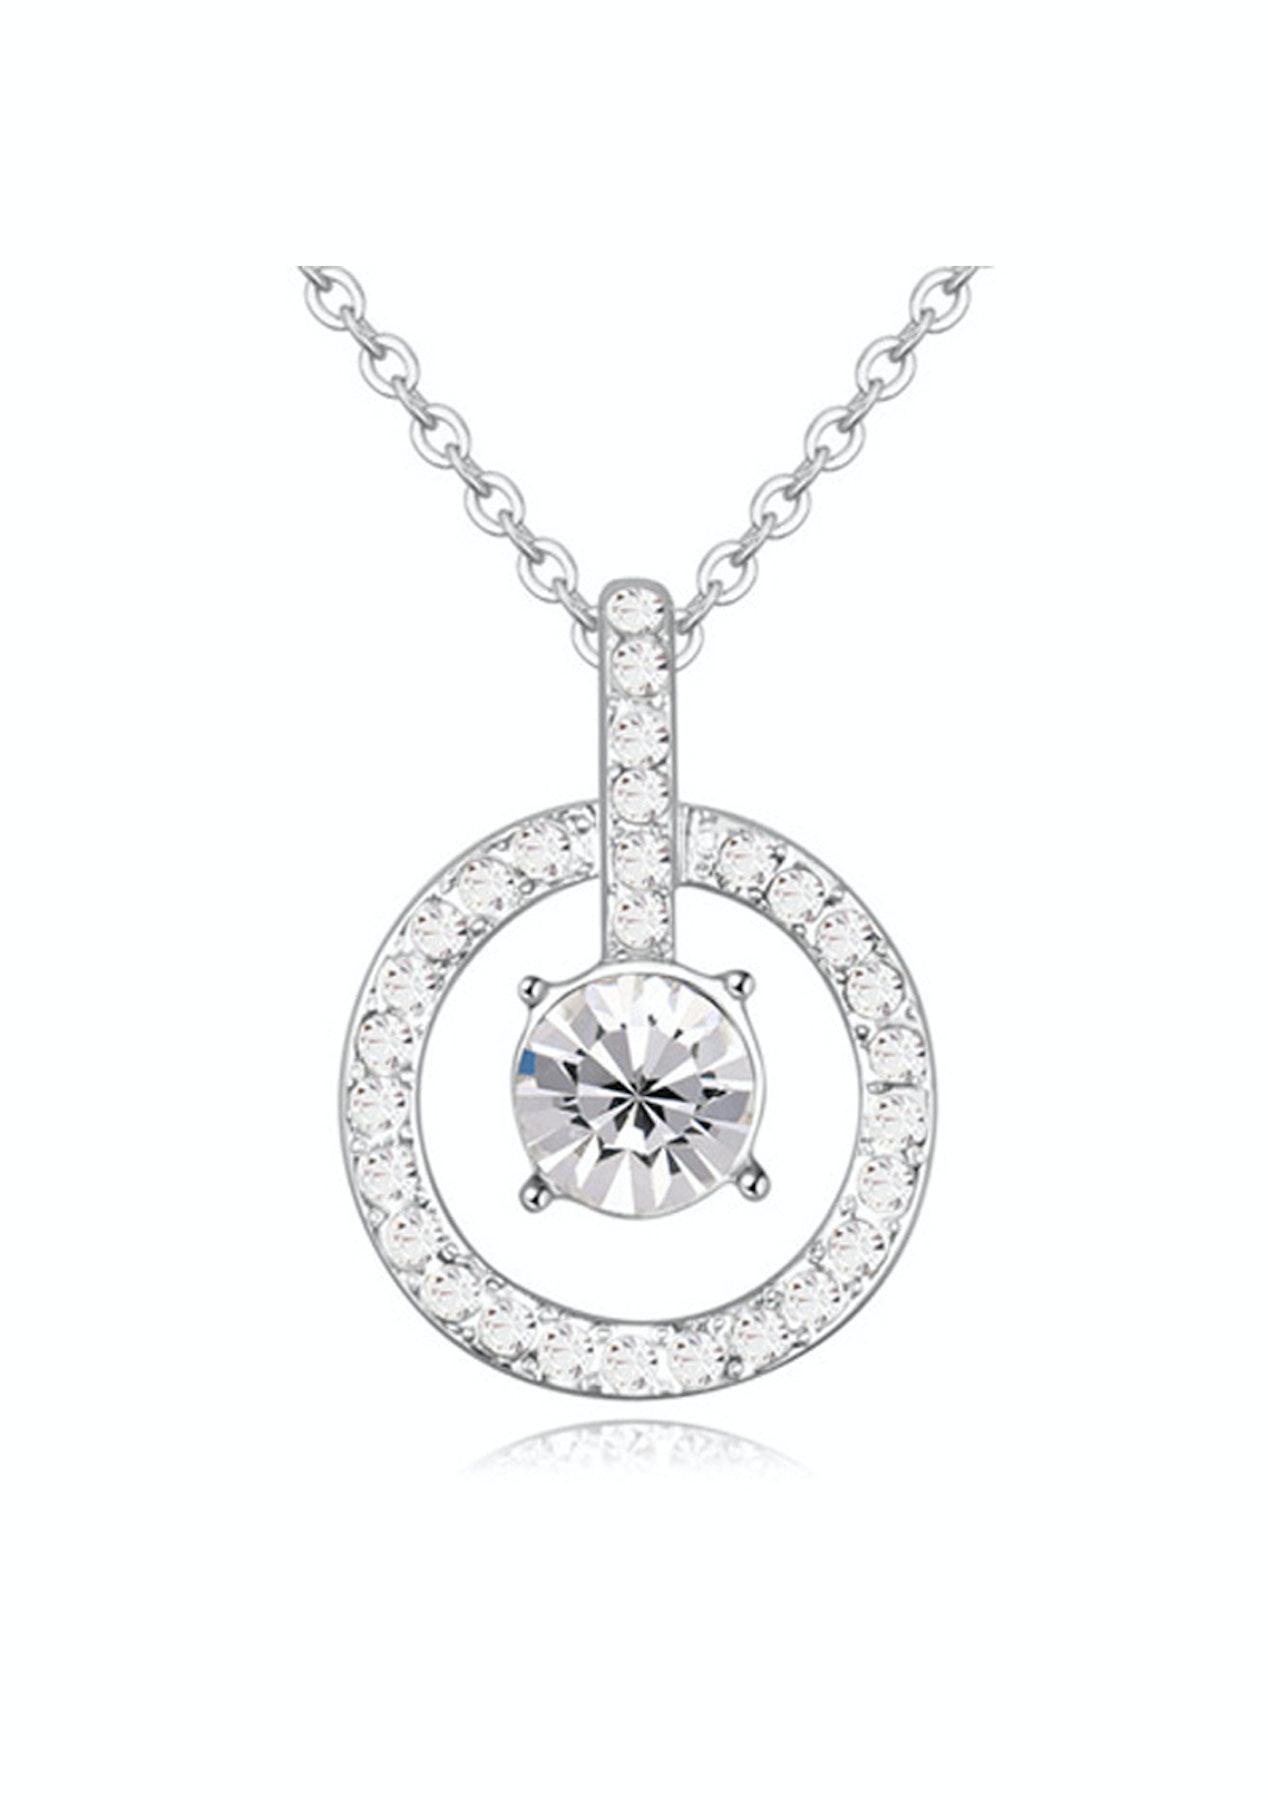 26c124c53039bf Pierre Pendant Necklace Embellished with Crystals from Swarovski - 600+  Swarovski Elements - Under  20 - Onceit